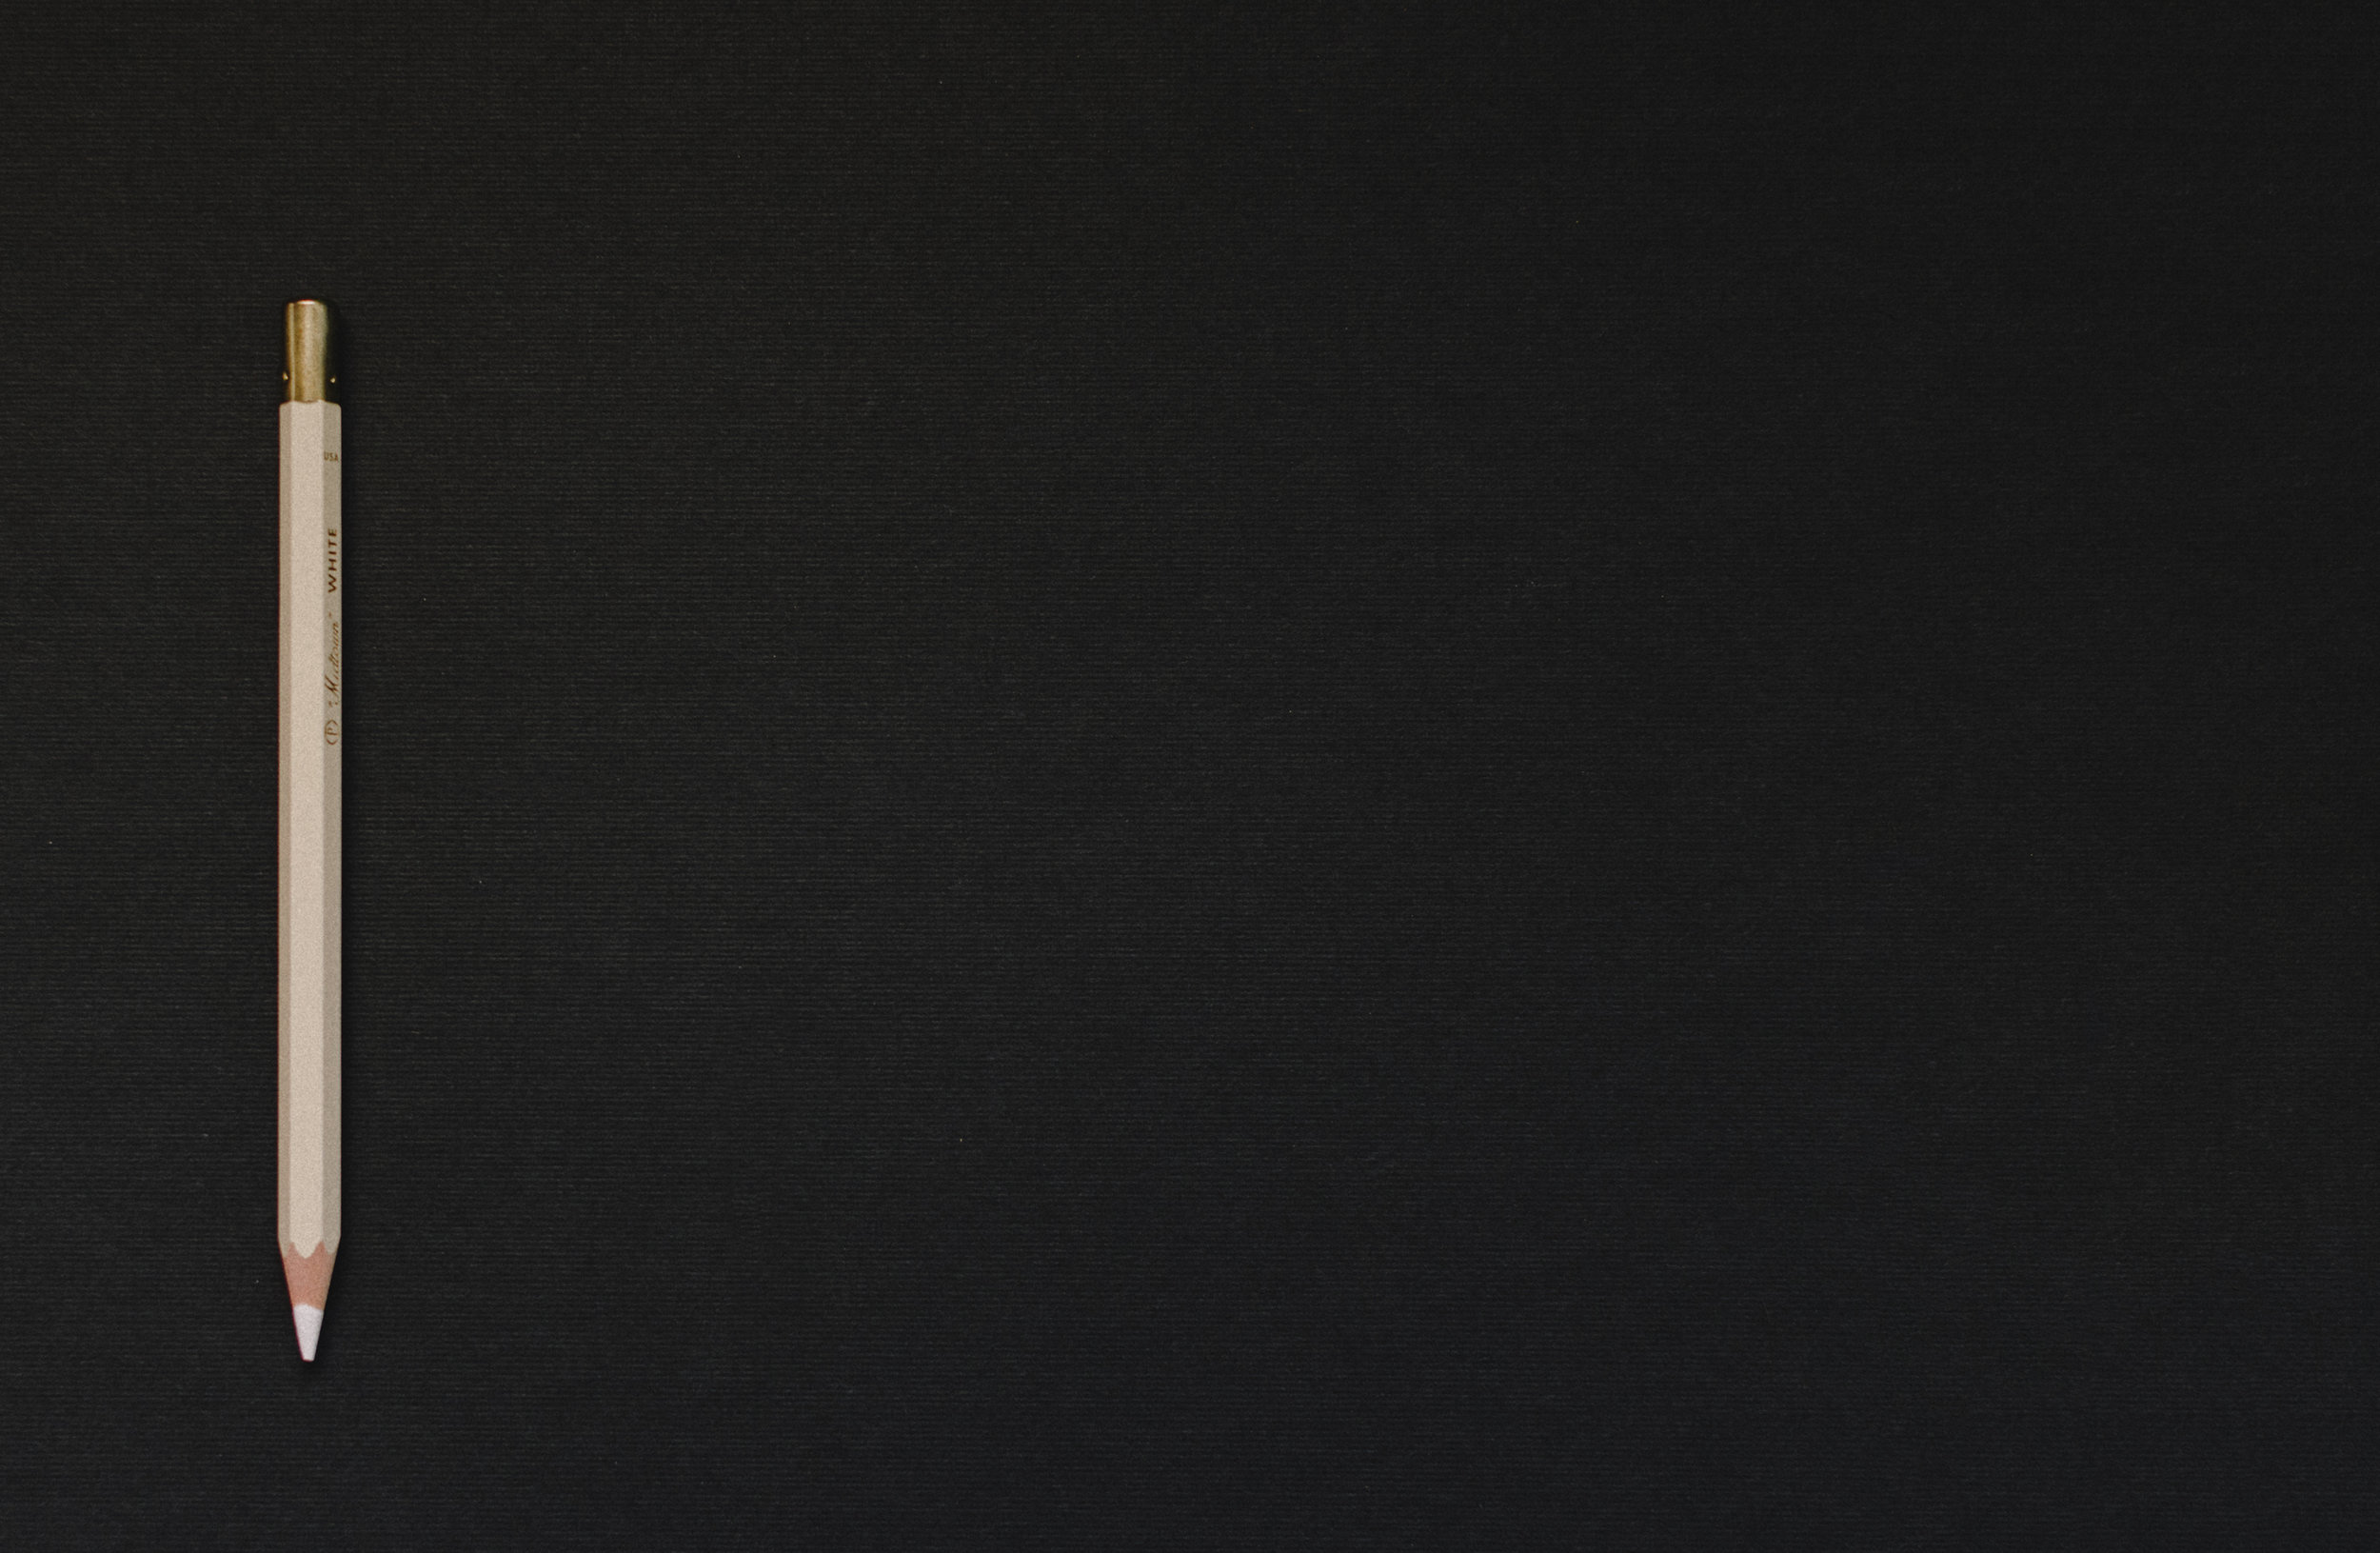 curriculum vitae May 2019 - EDUCATIONPhD, Creative Writing, University of Utah, 2020 (expected)MFA, Poetry, George Mason University, 2013MA, Fiction, University of Cincinnati, 2008BA, English, University of Cincinnati, 2006